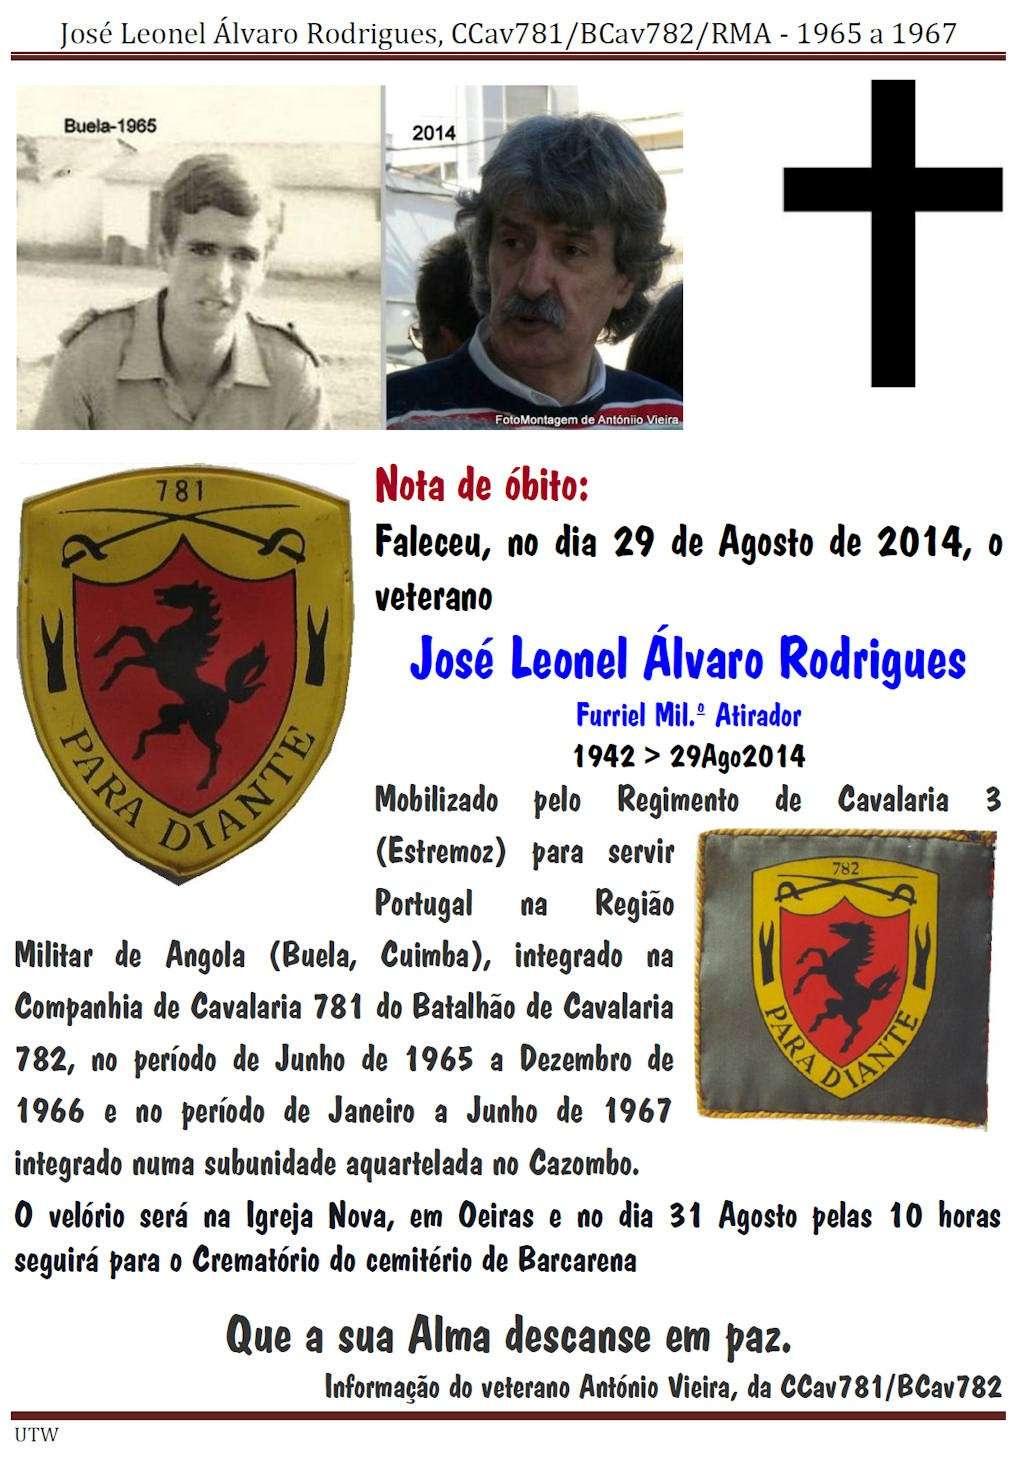 Faleceu o veterano José Leonel Álvaro Rodrigues, Furriel Mil.º, da CCav781/BCav782 - 29Ago2014 Josele11